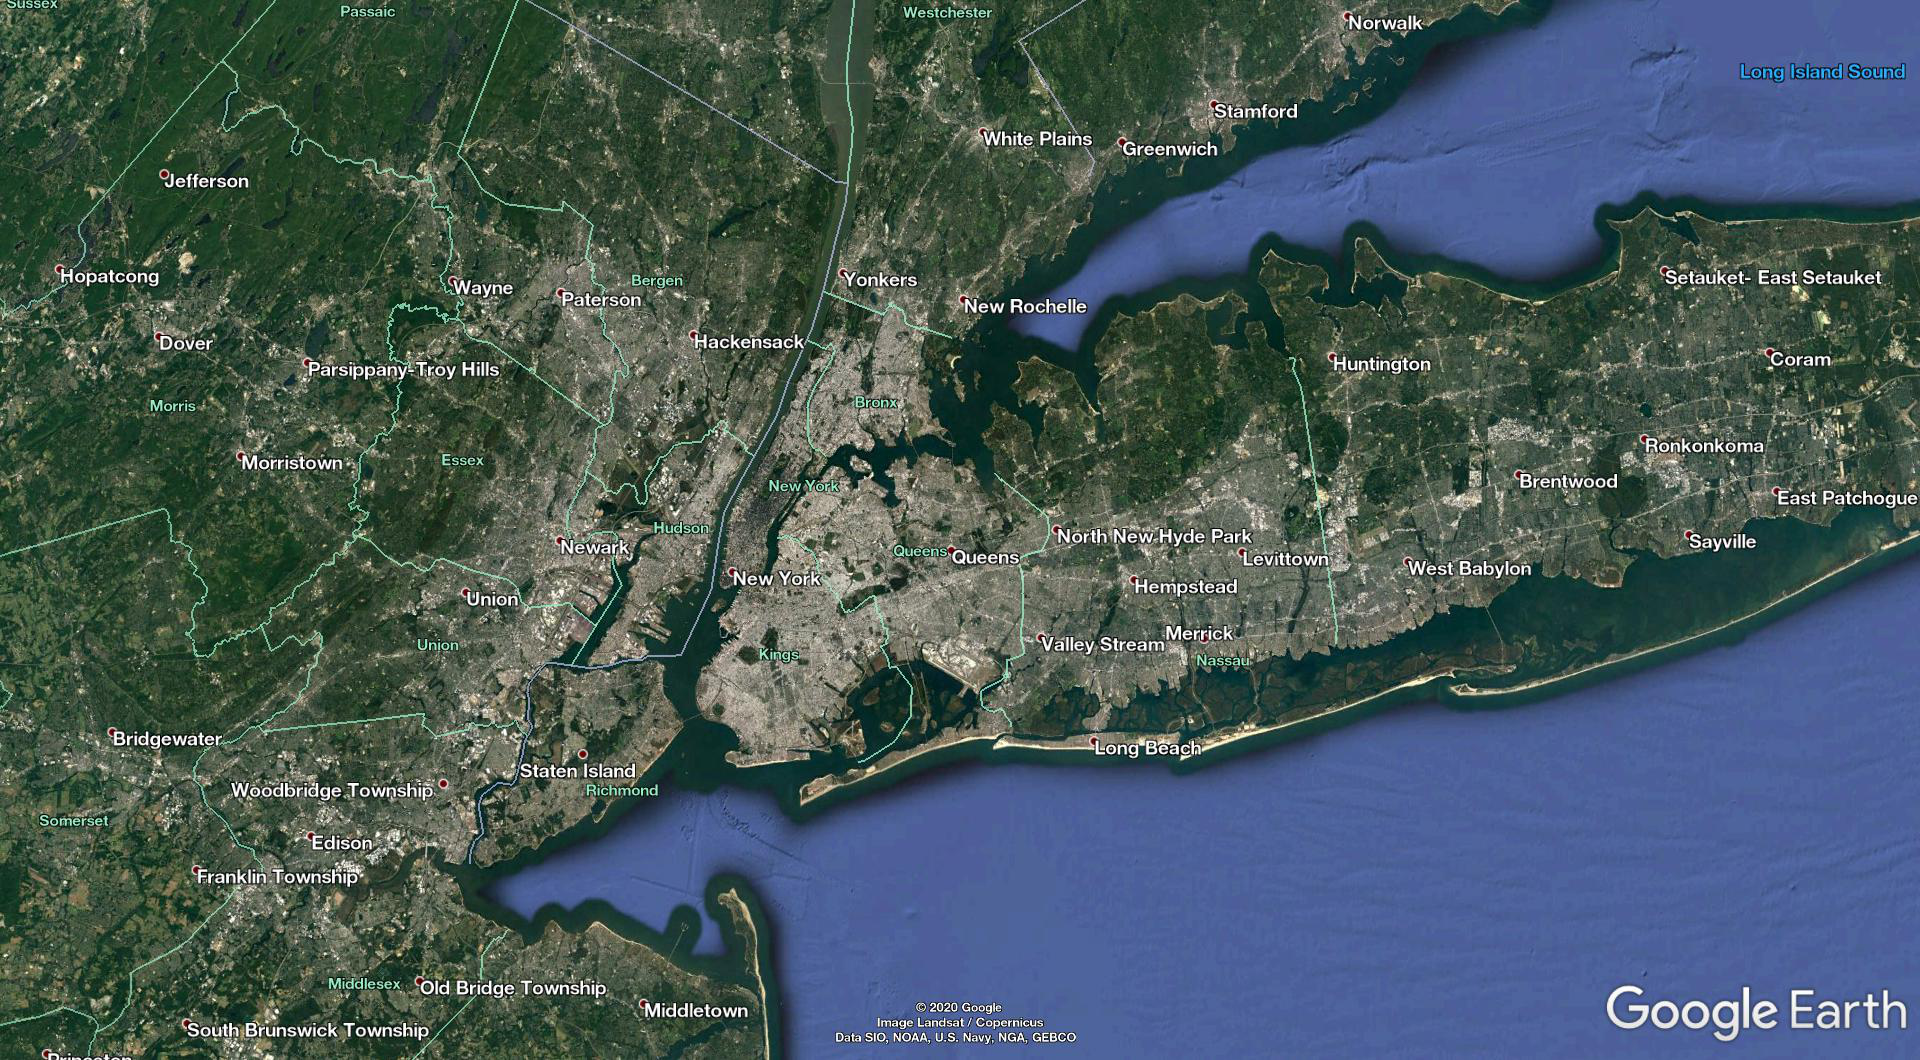 New York City metropolitan area